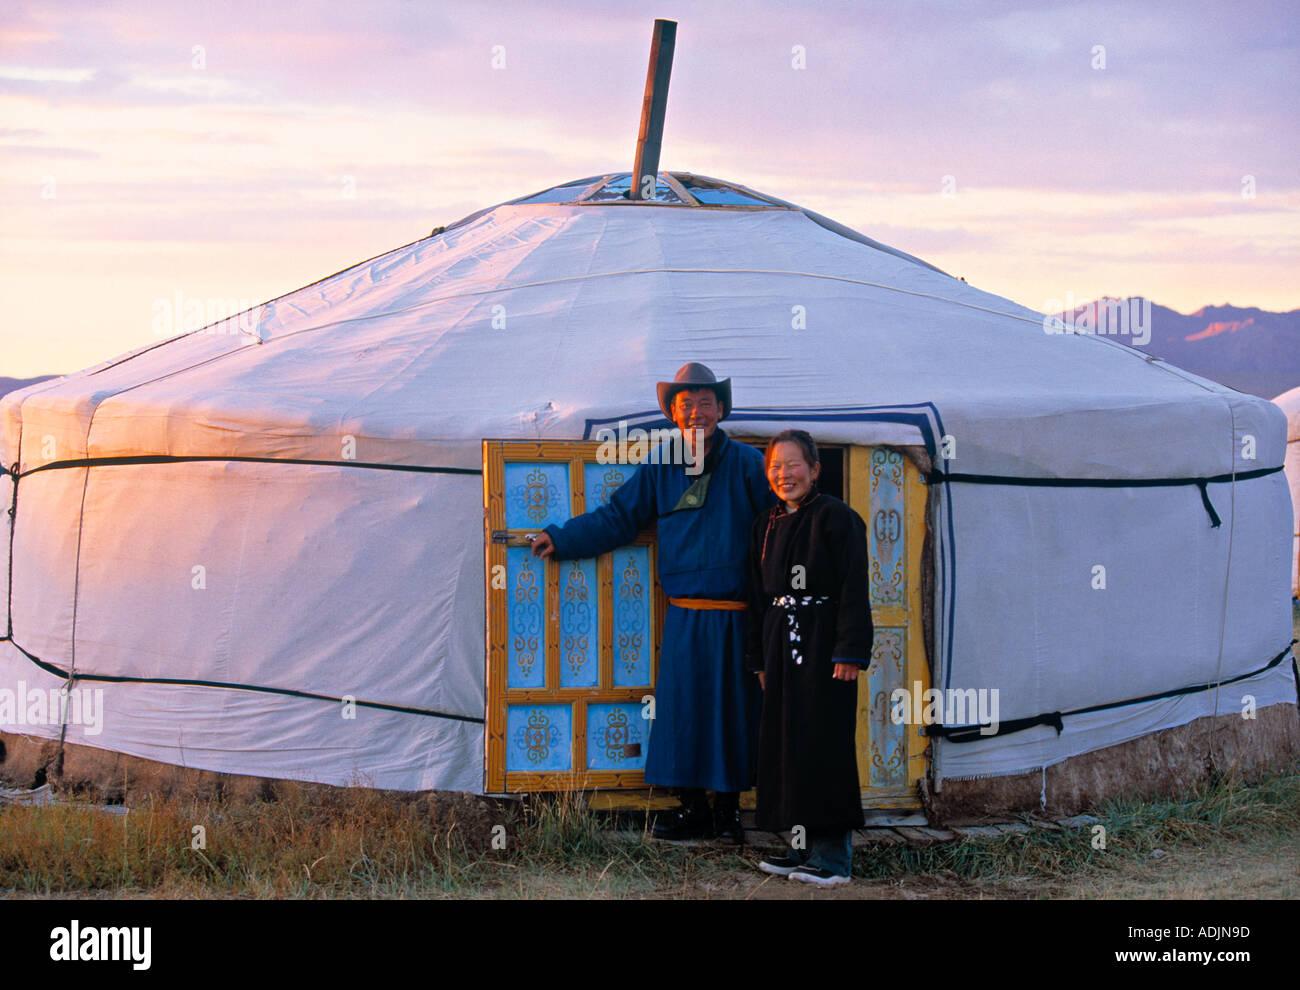 Yurts viviendas de Mongolia Mongolia Imagen De Stock